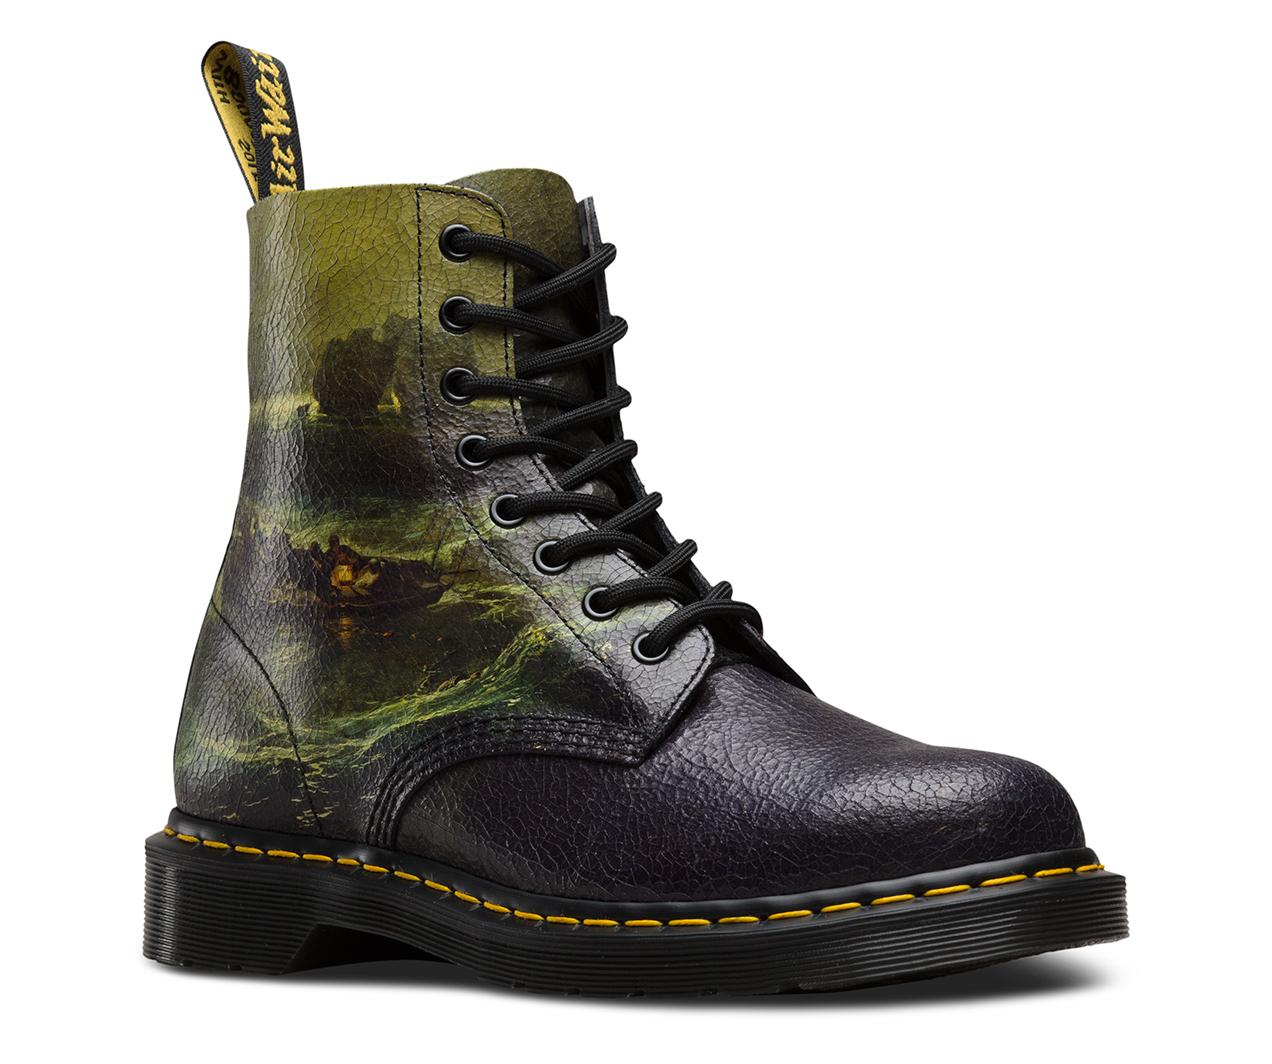 JMW Turner Fishermen 1460 Pascal  8Eye Boots  Official Dr Martens Store